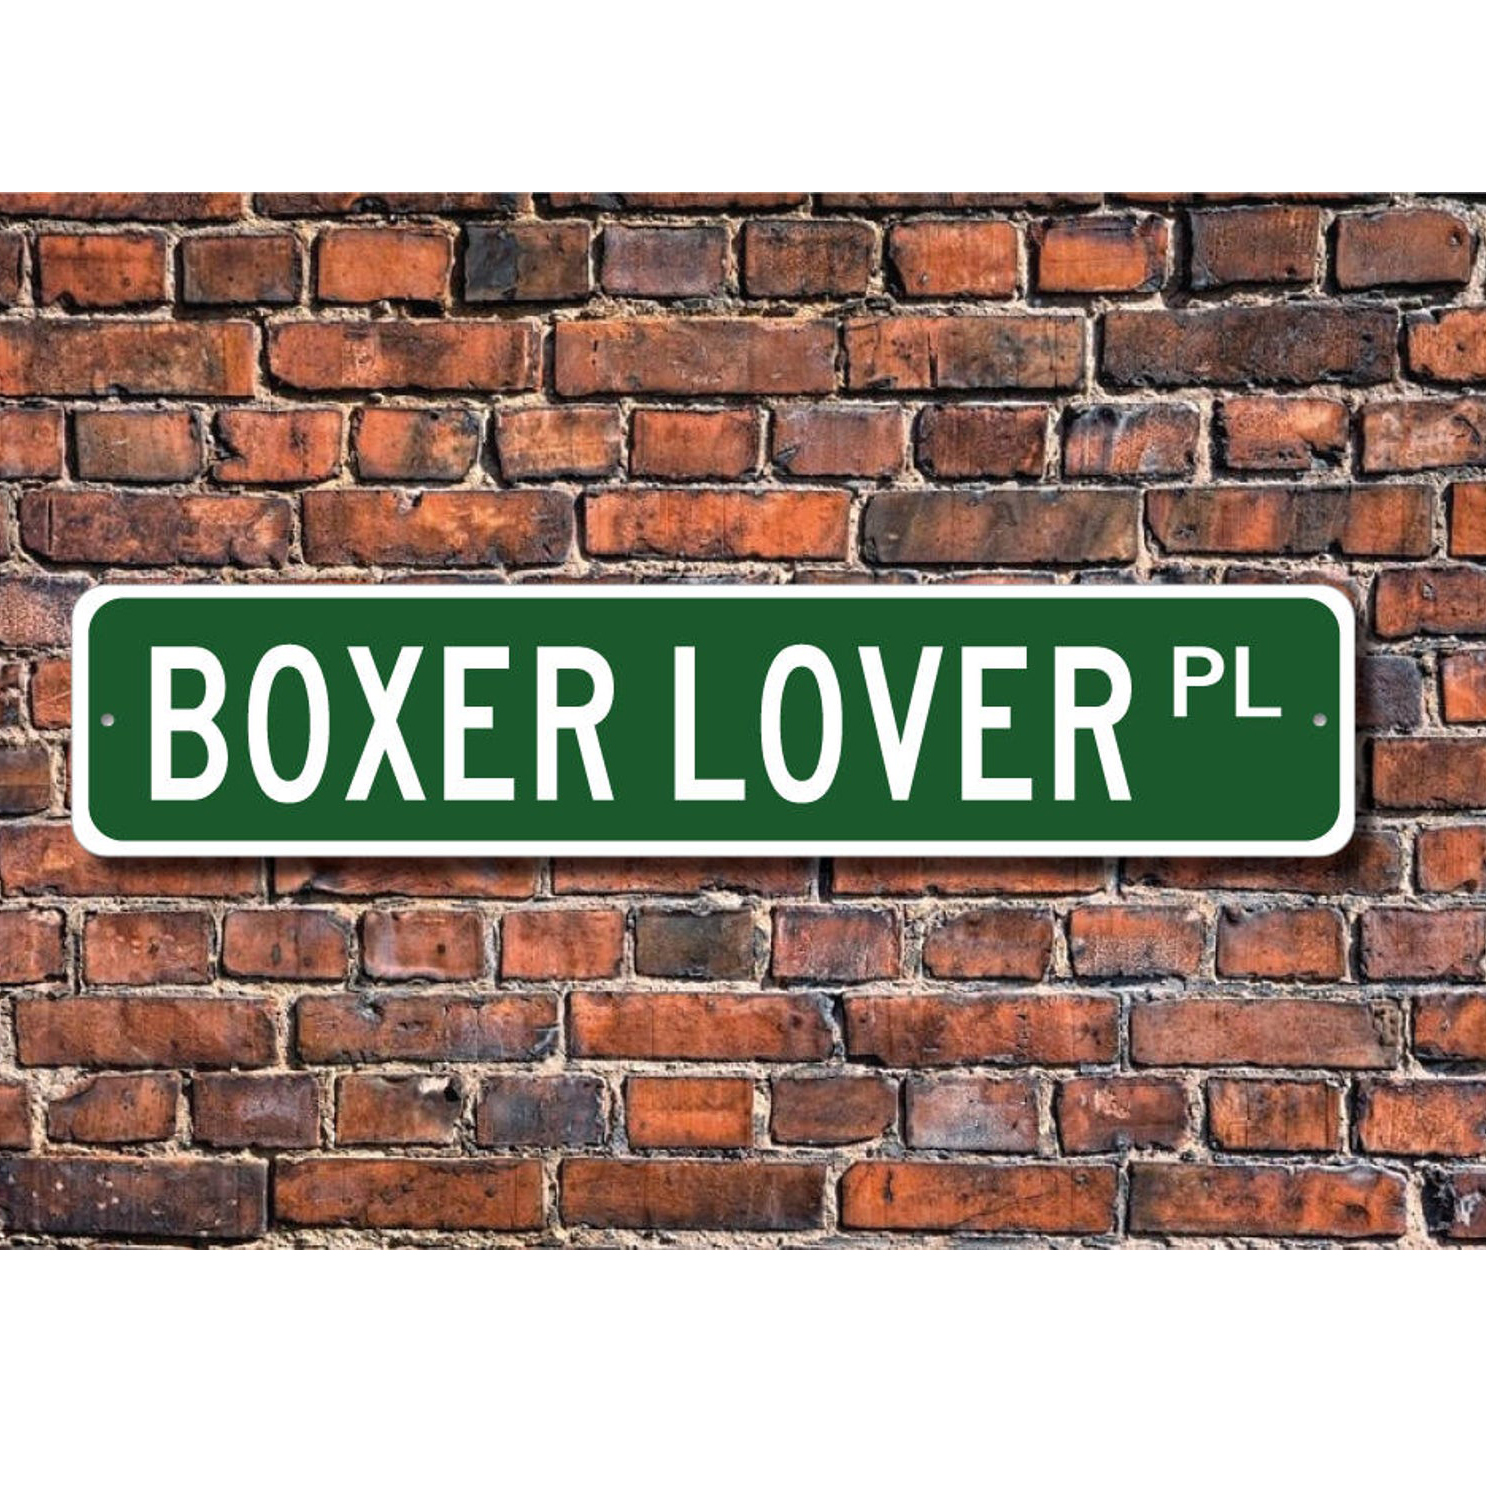 Boxer Lover Street Sign via ezStreetSignsCom on Etsy